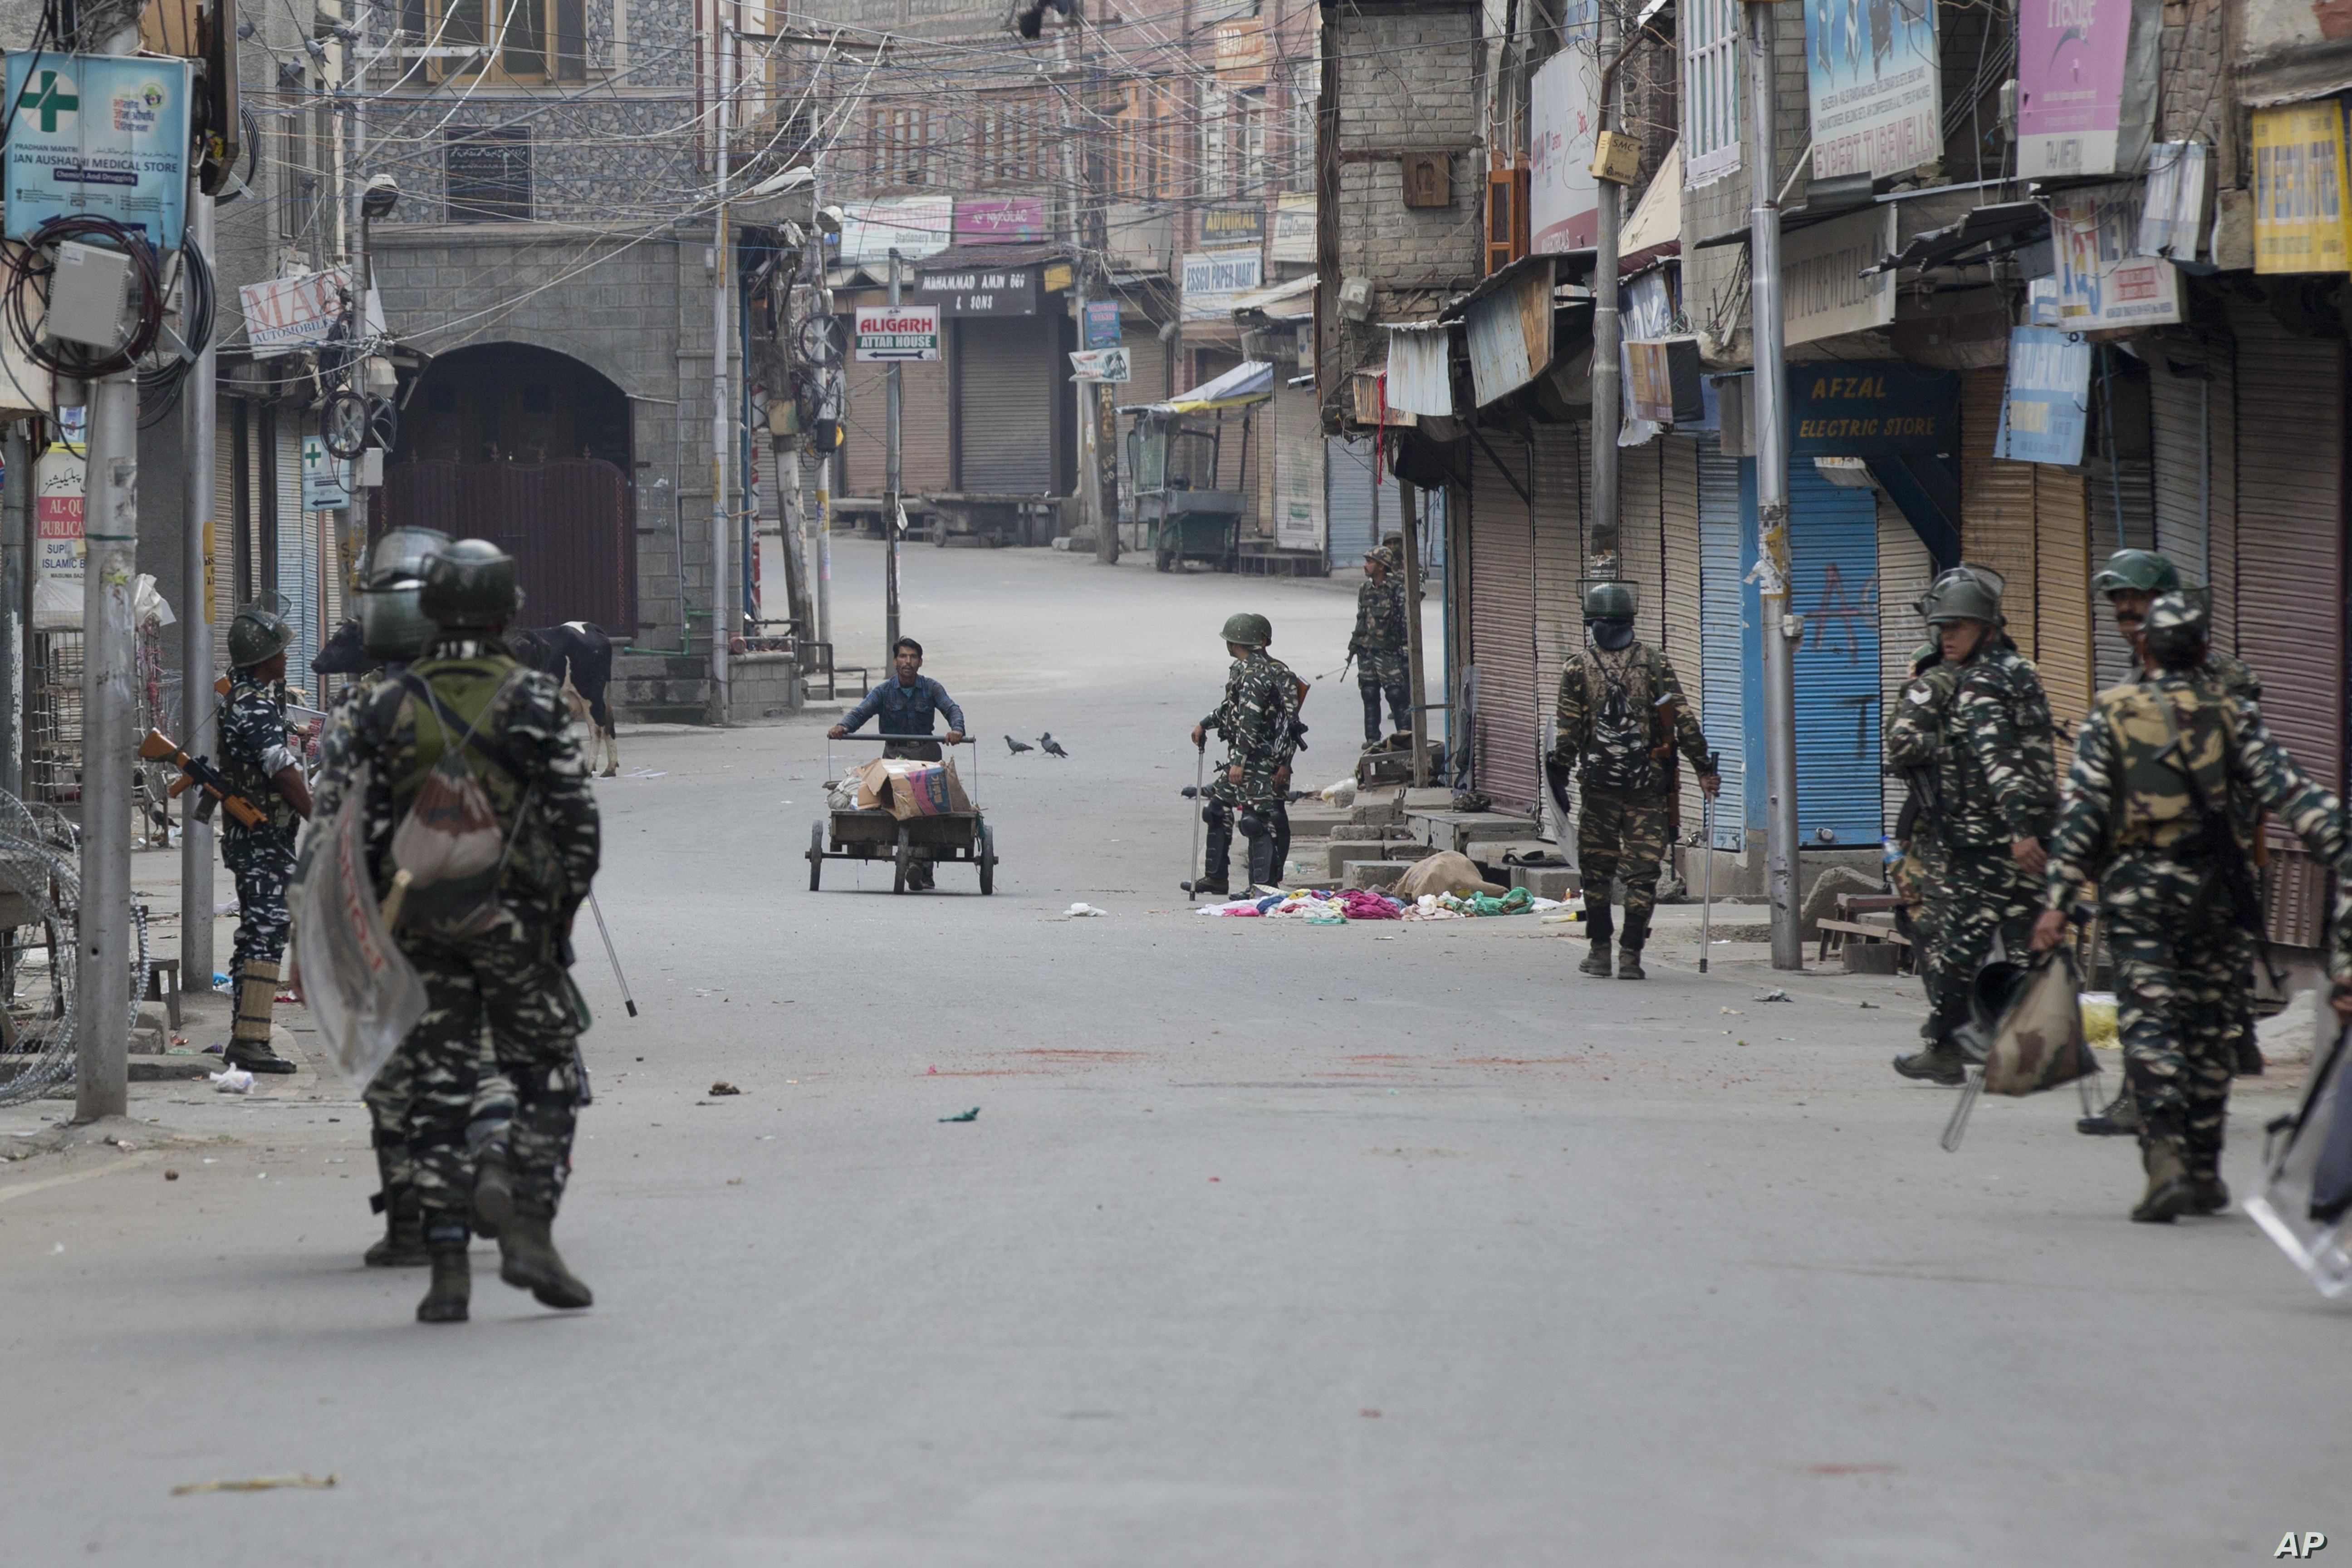 A Kashmiri municipal worker pushes a trash cart as Indian paramilitary soldiers patrol during curfew in Srinagar, India-controlled Kashmir, Aug. 6, 2019.